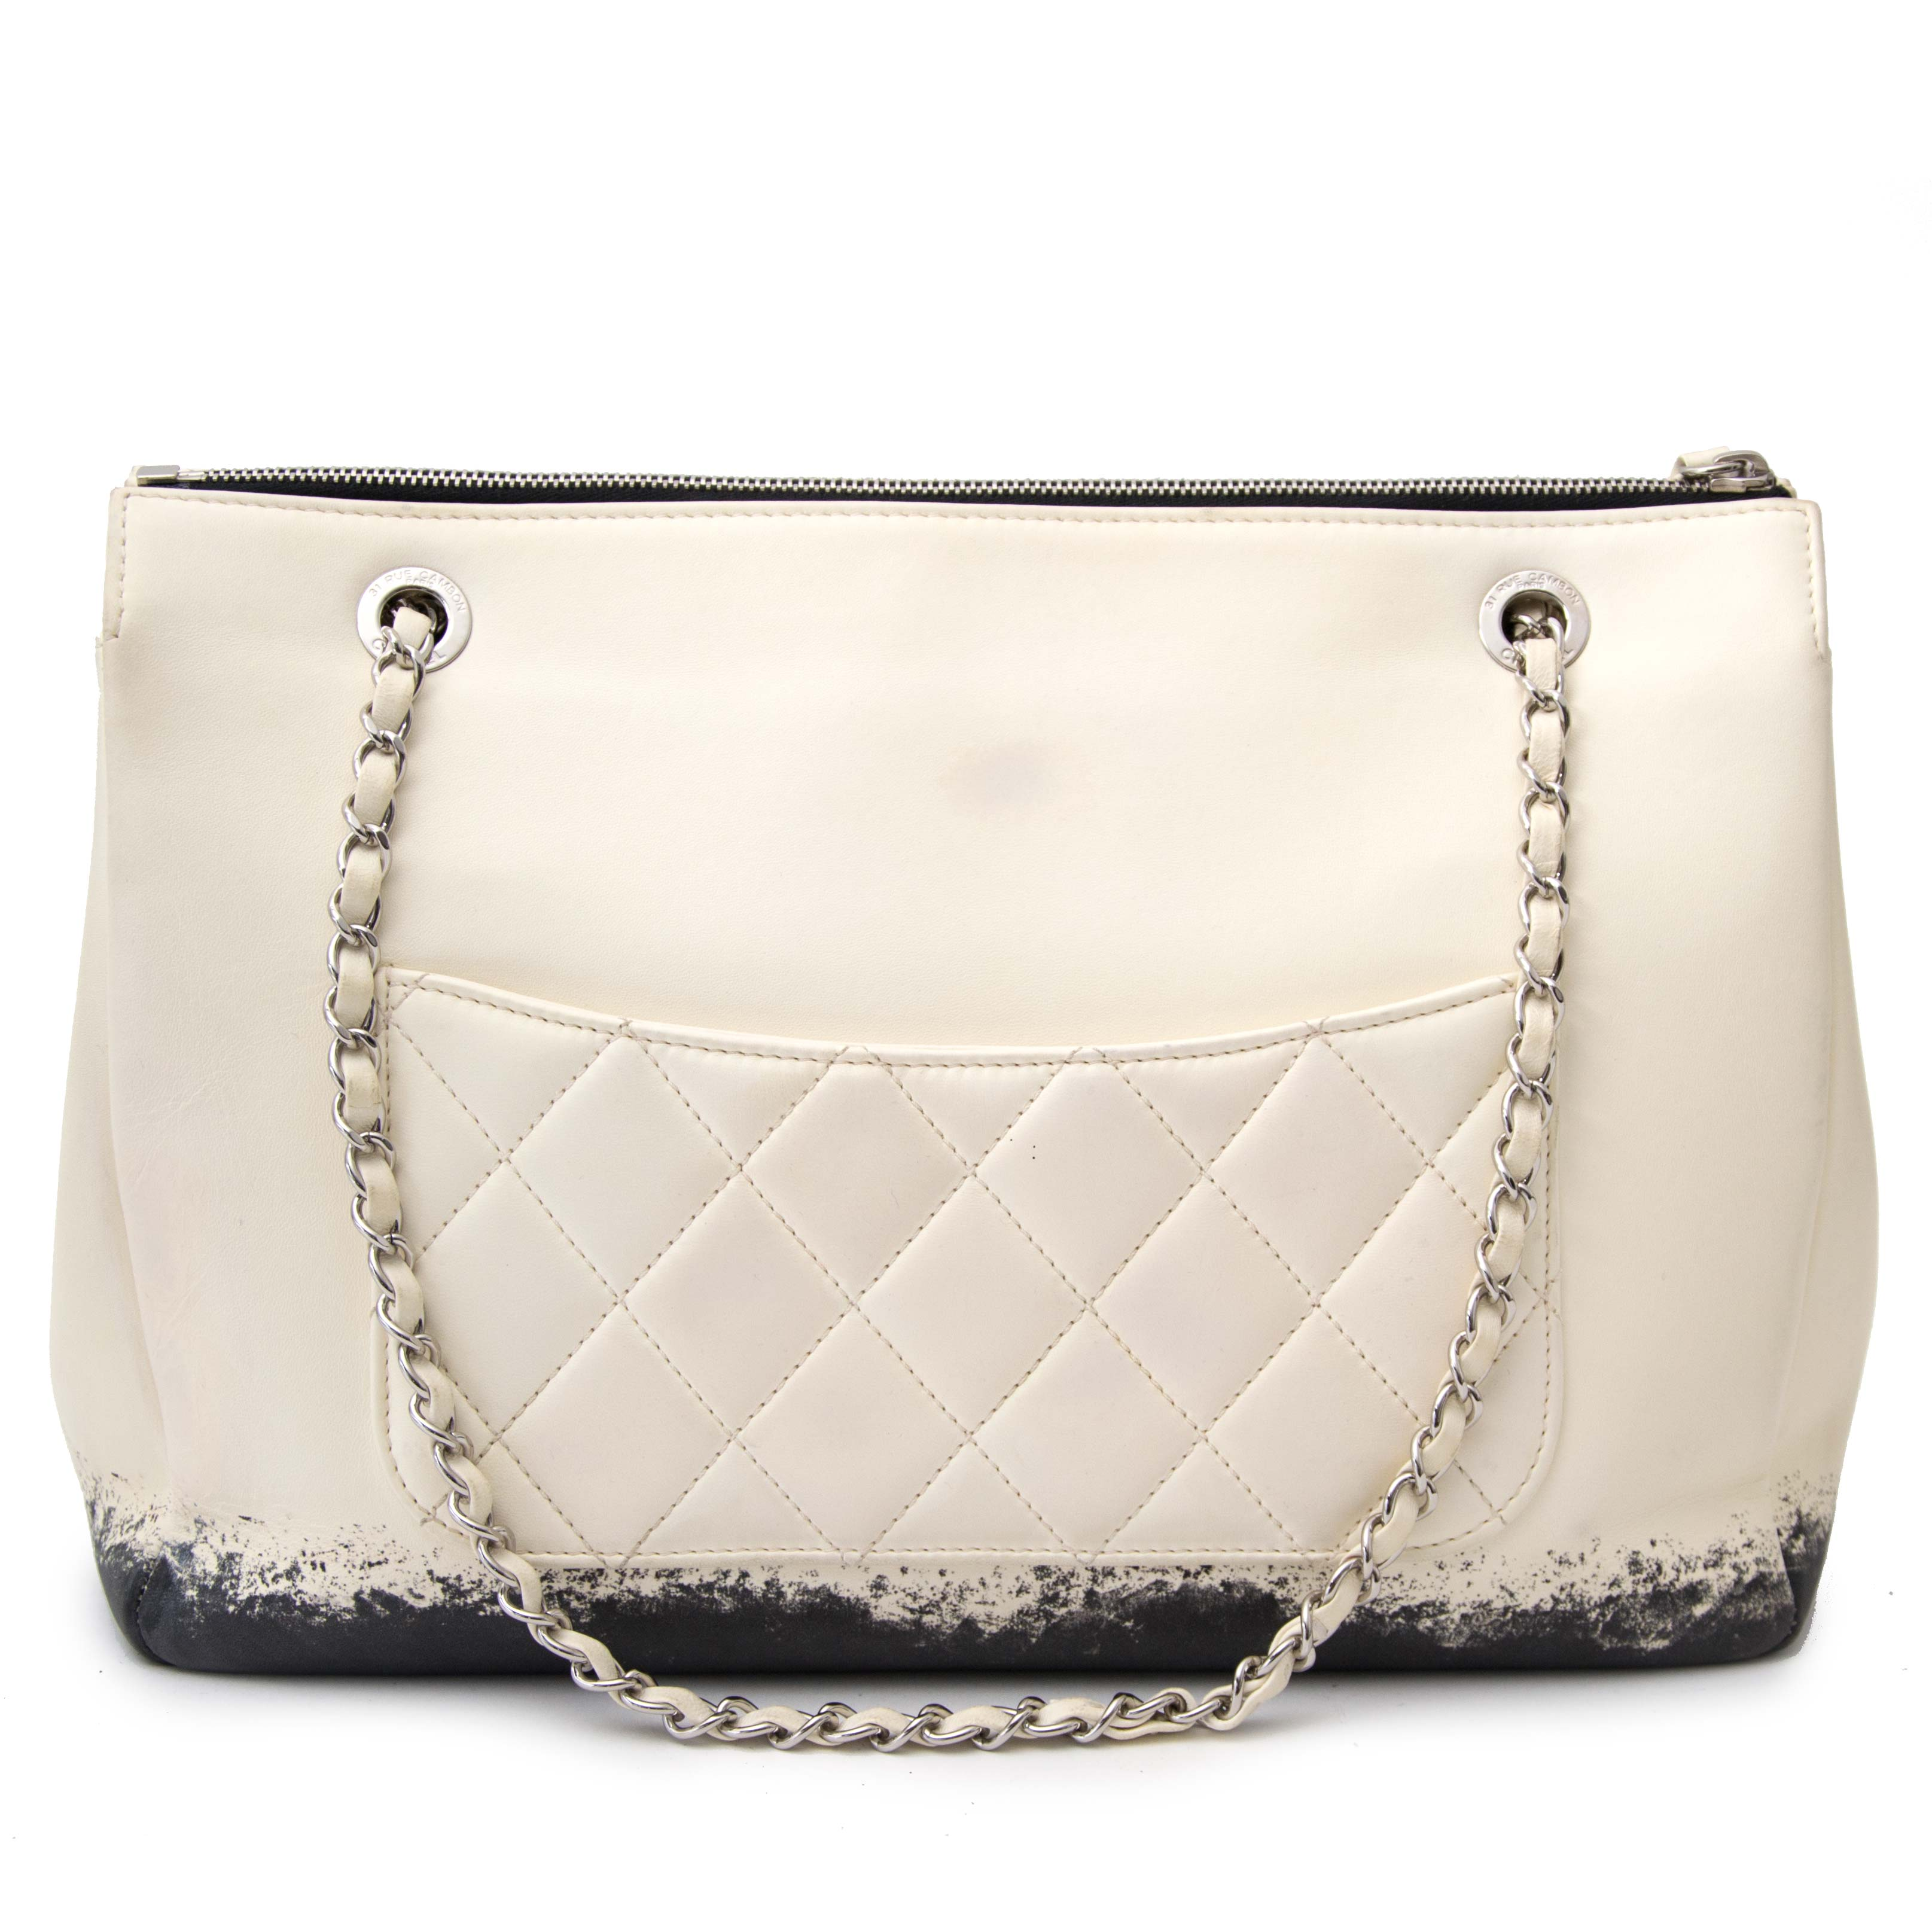 Exclusive 2011 Chanel Cream Paint Splatter Flap Bag